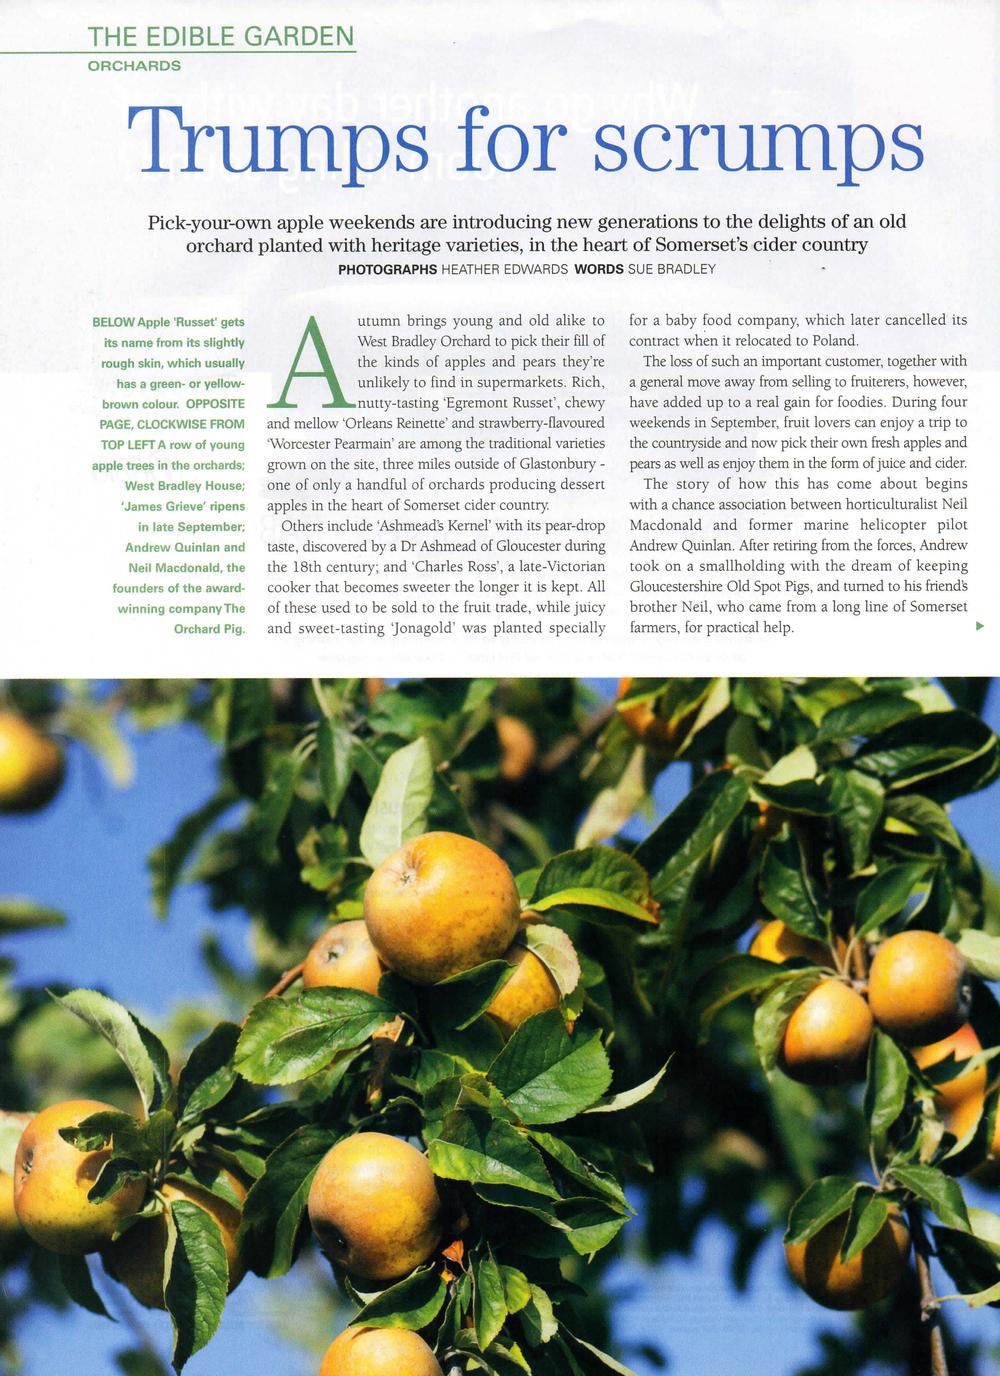 West Bradley Orchard EG001-1.jpg